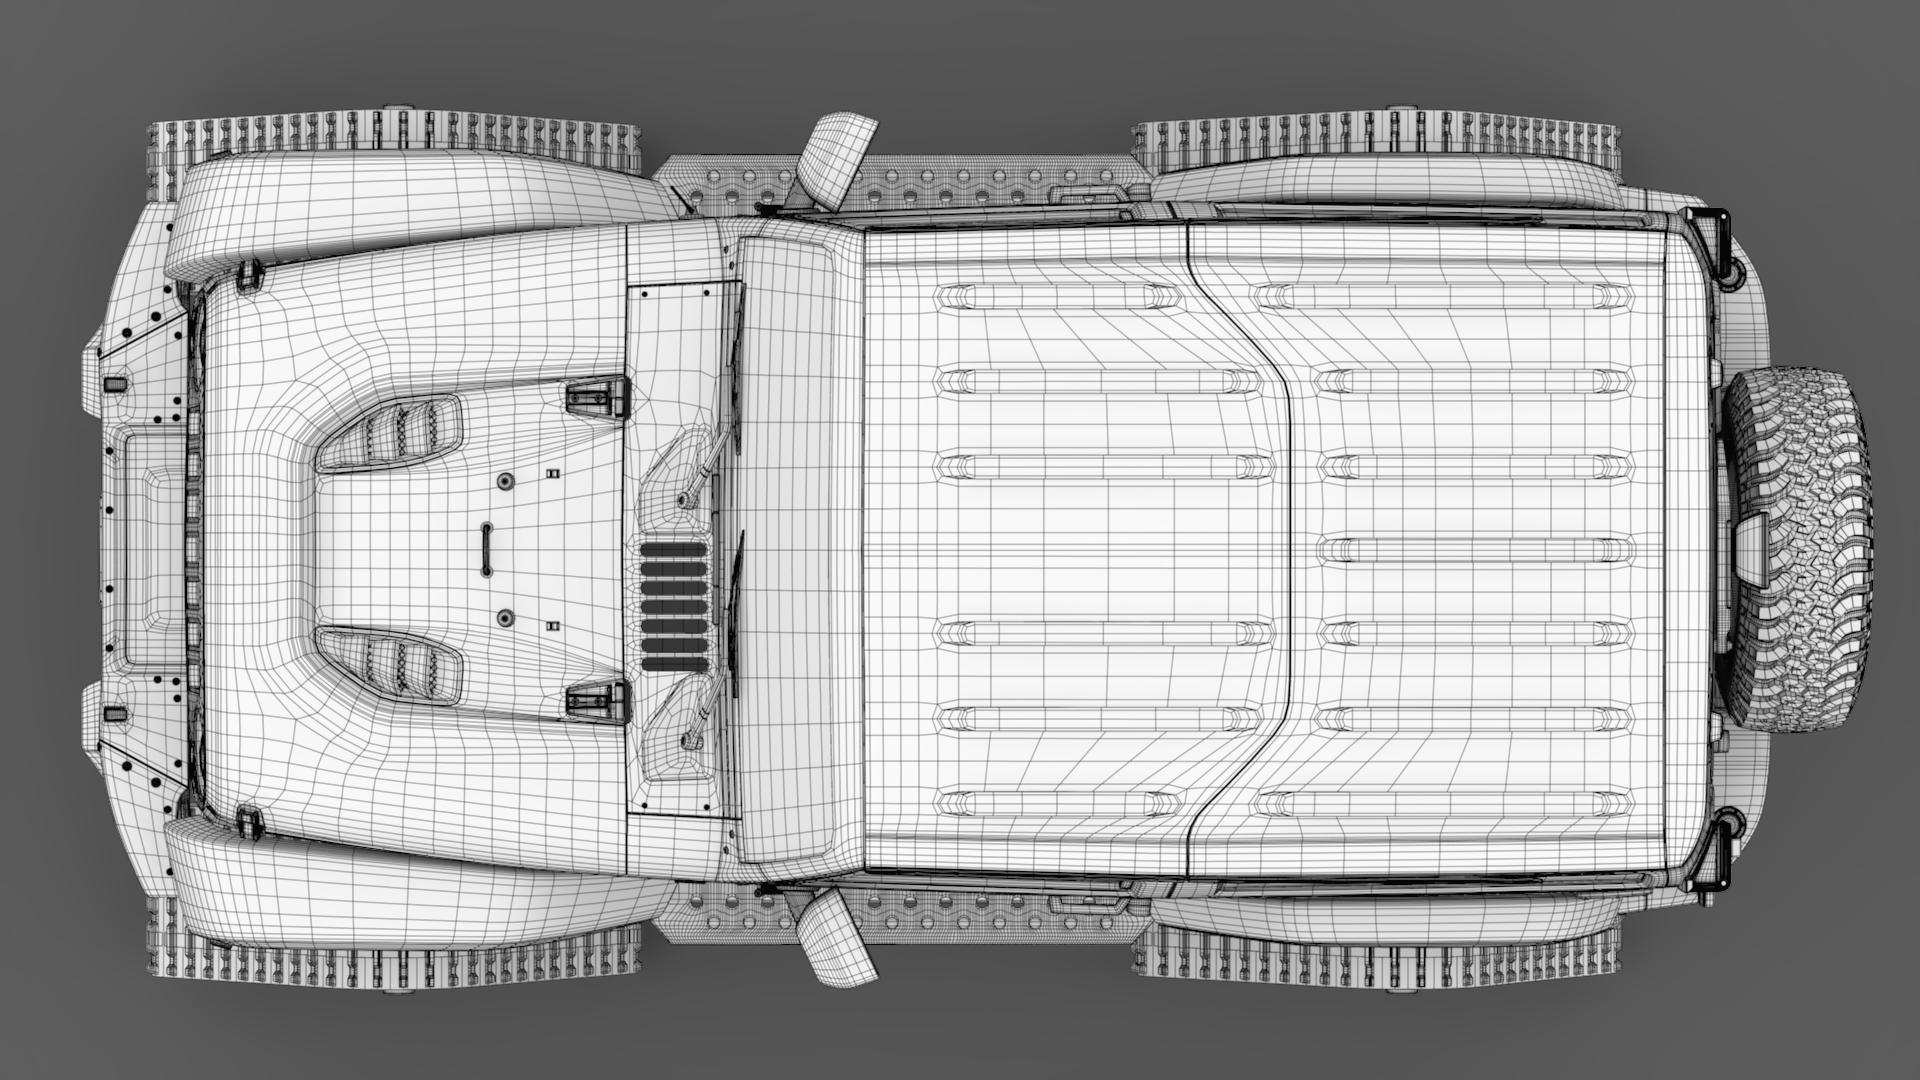 jeep wrangler crawler rubicon recon jk 2017 3d model max fbx c4d lwo ma mb hrc xsi obj 276924